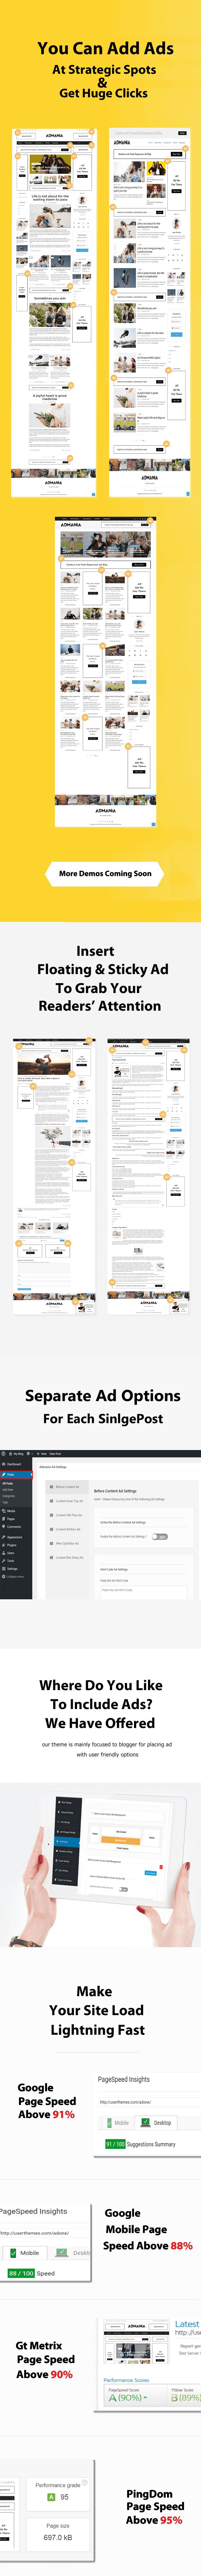 Admania - Best AD Optimized WordPress Theme For Adsense & Affiliate Enthusiasts (Blog / Magazine) Admania – Best AD Optimized WordPress Theme For Adsense & Affiliate Enthusiasts (Blog / Magazine) featuredlistallopts